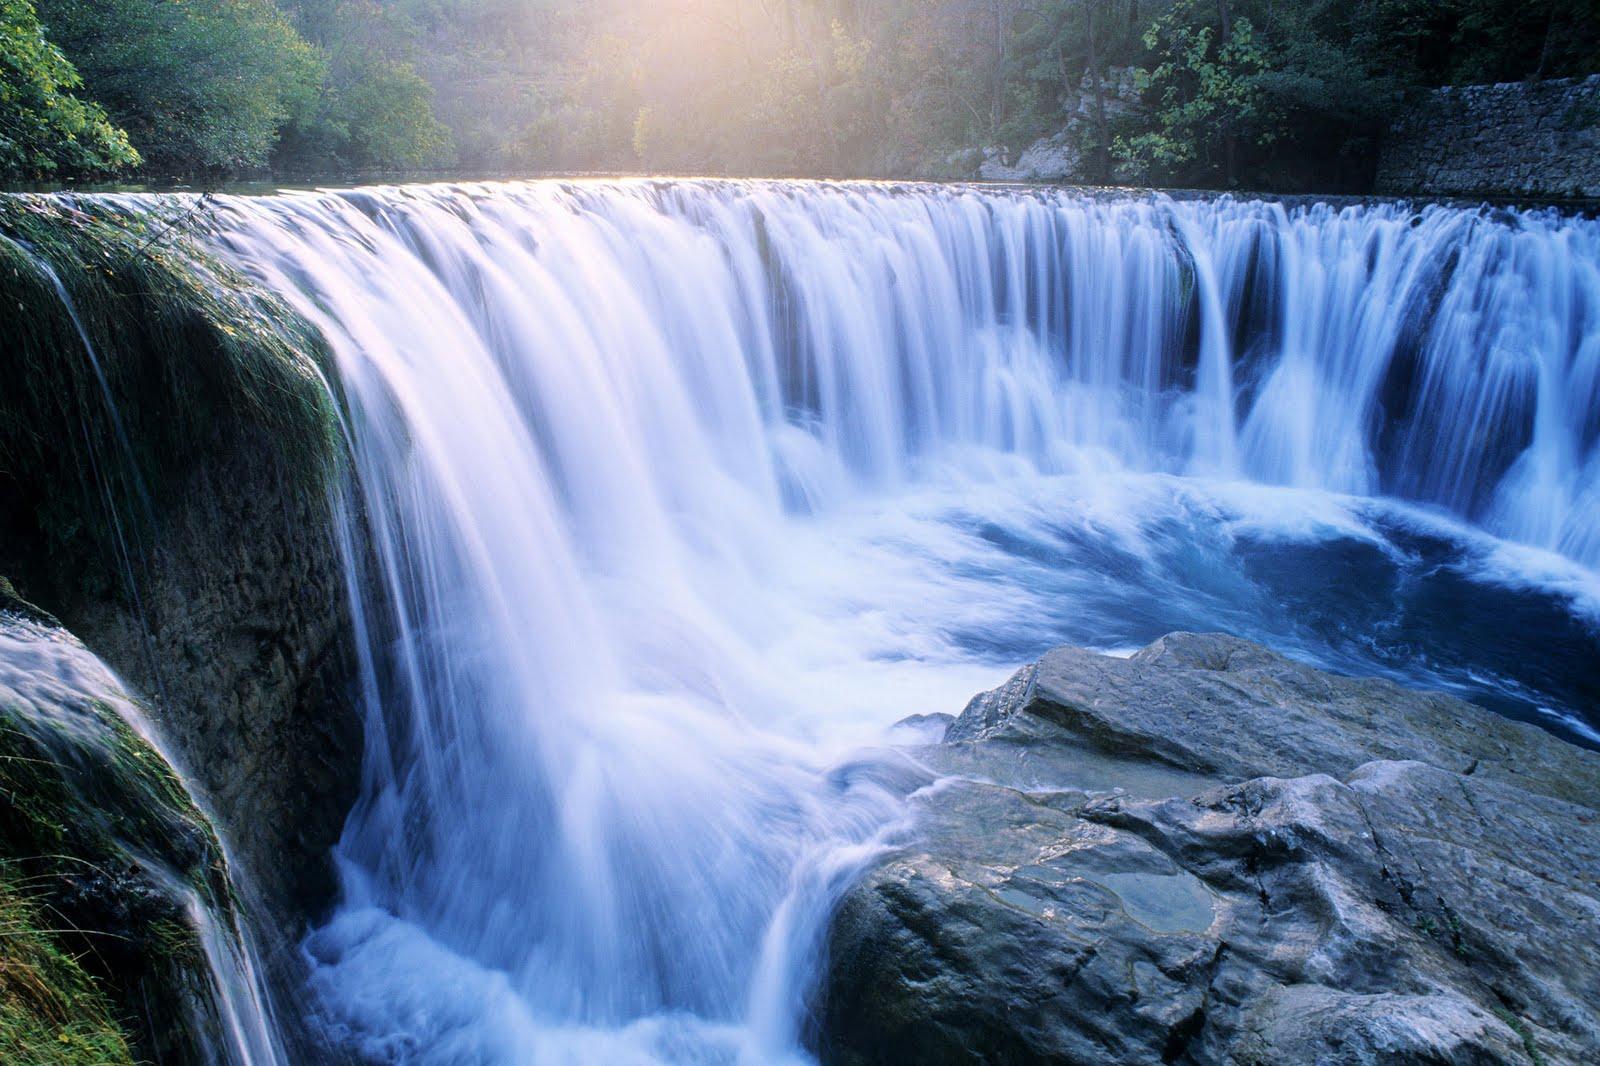 HD Widescreen Wallpapers: Gorgeous Desktop Waterfall